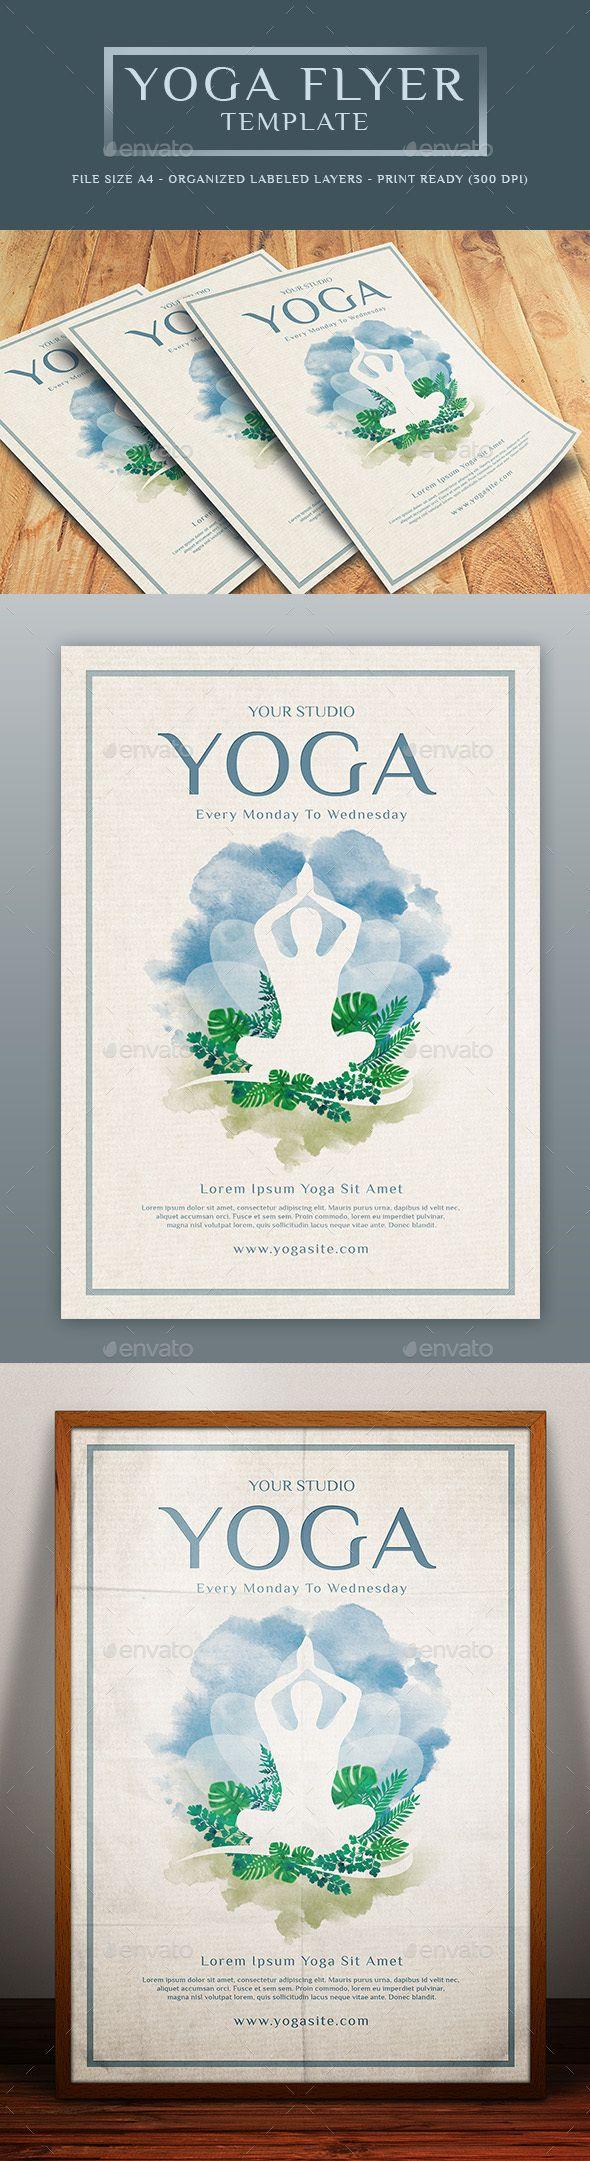 82 best Yoga ♡ Marketing images on Pinterest | Yoga flyer, Flyer ...